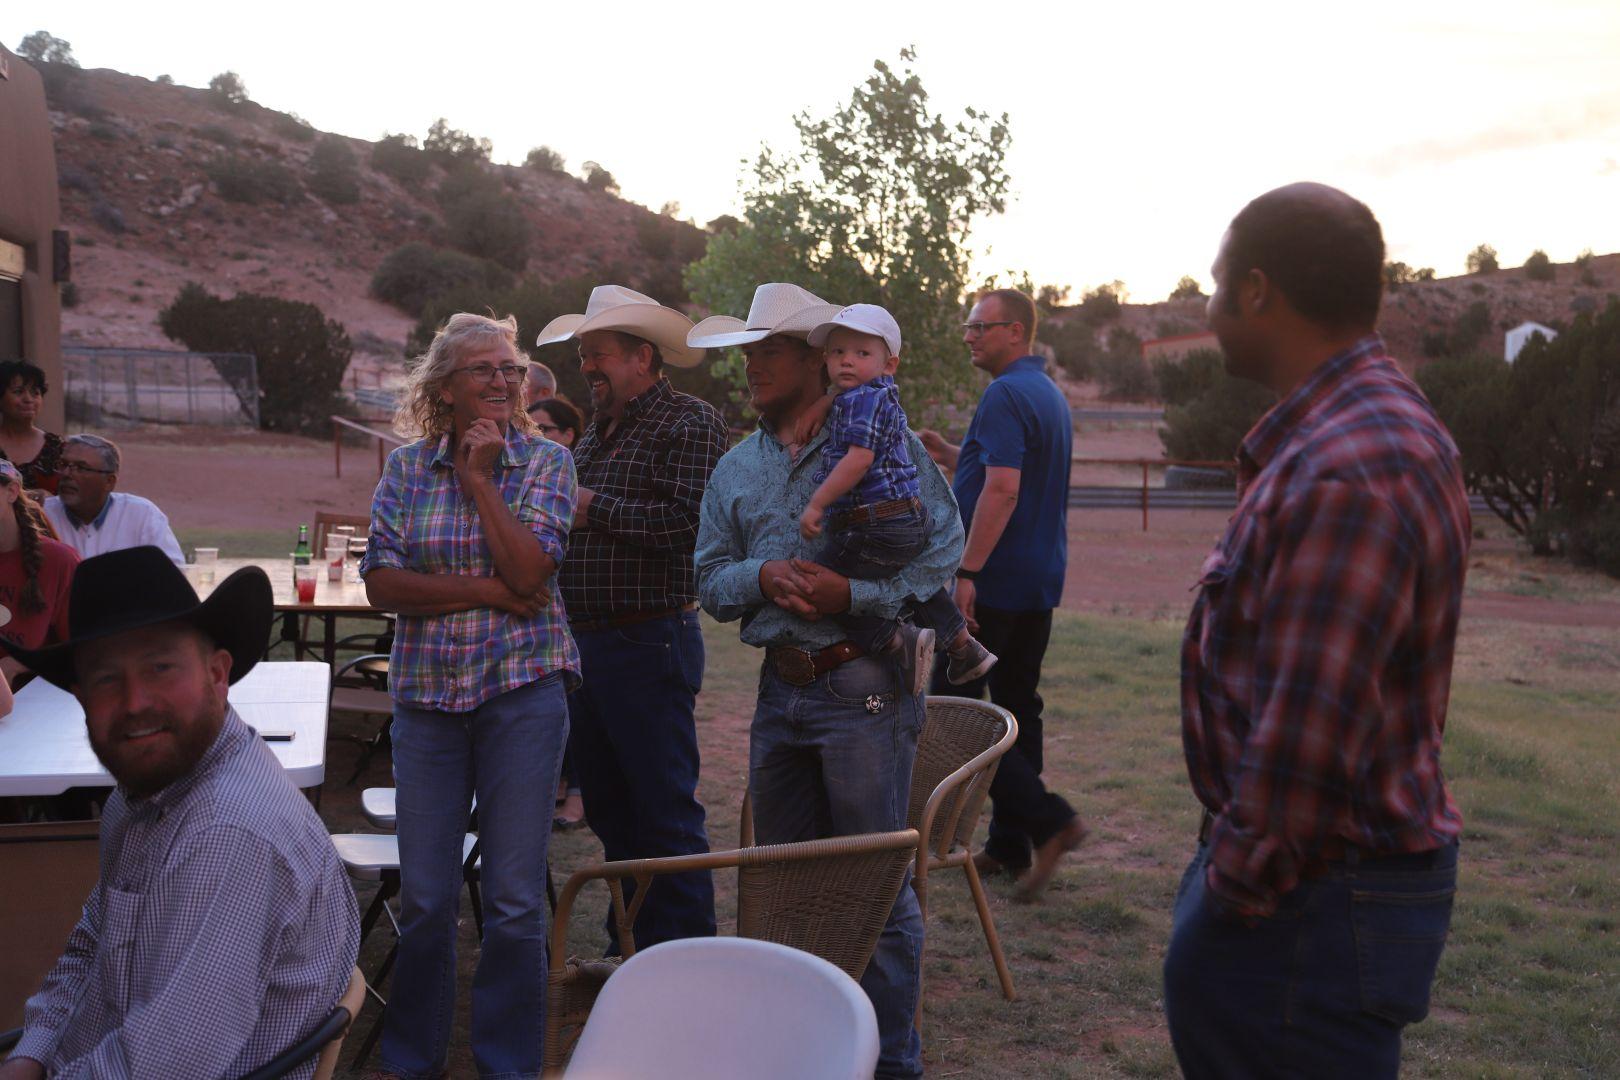 2018 05 Pecos Valley  148.jpg